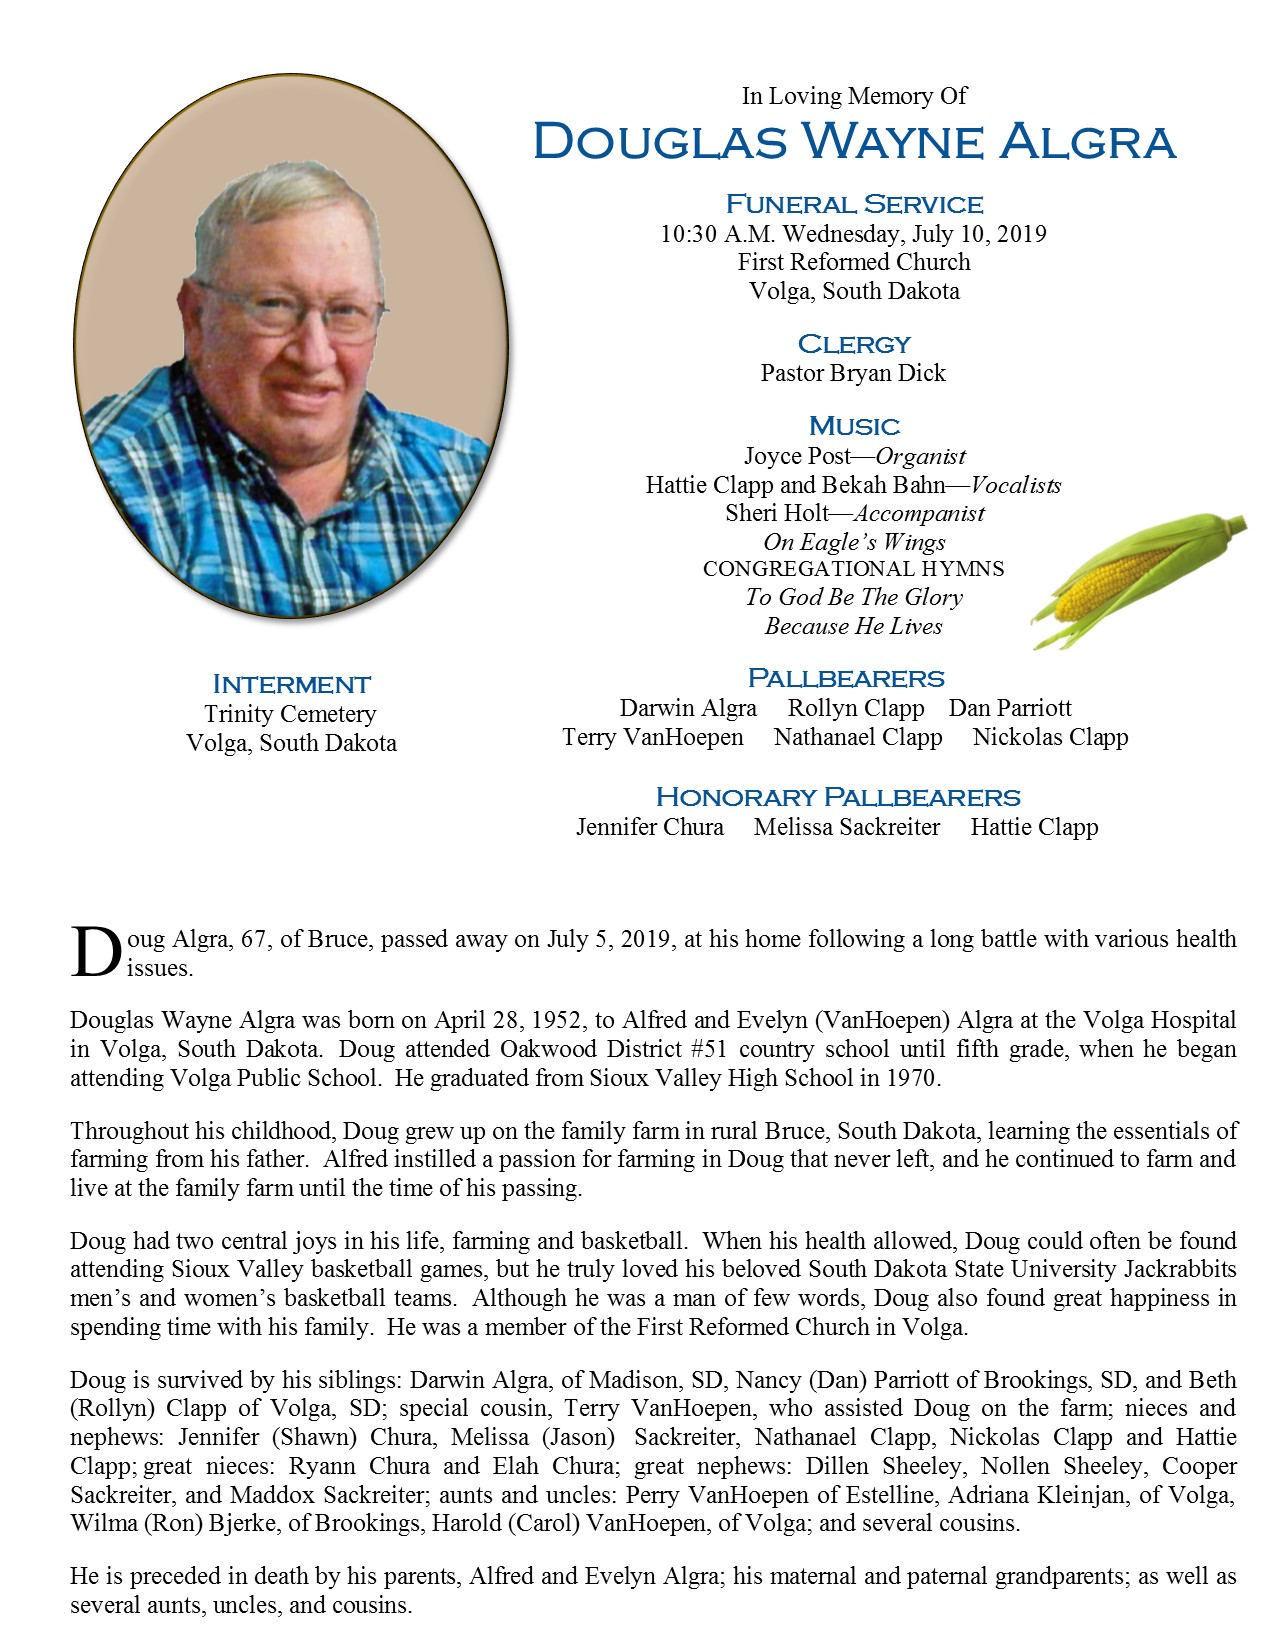 Obituary Doug Algra Eidsness Funeral And Cremation Services